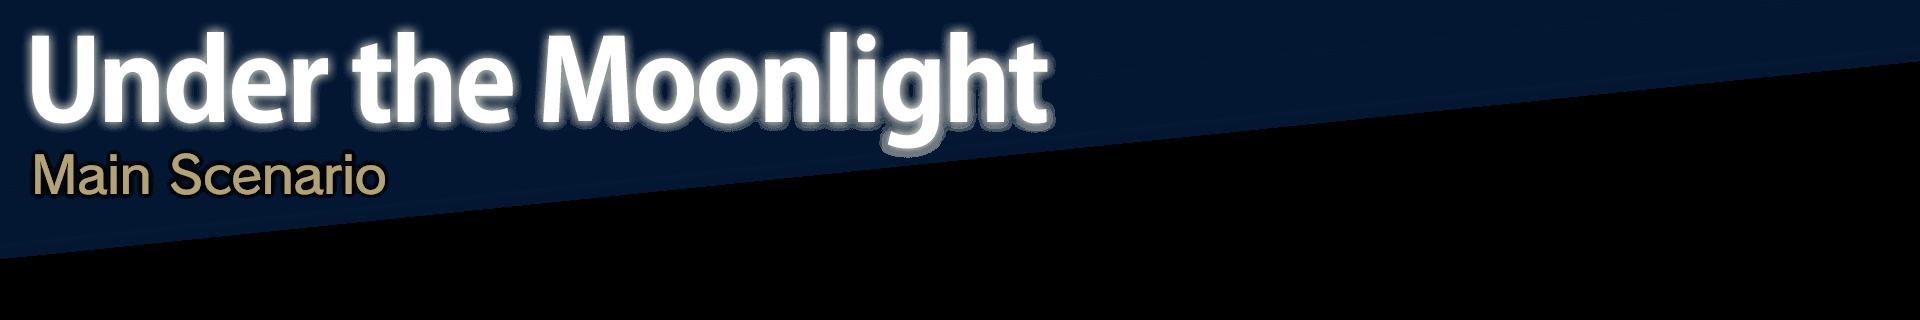 Under the Moonlight Main Scenario